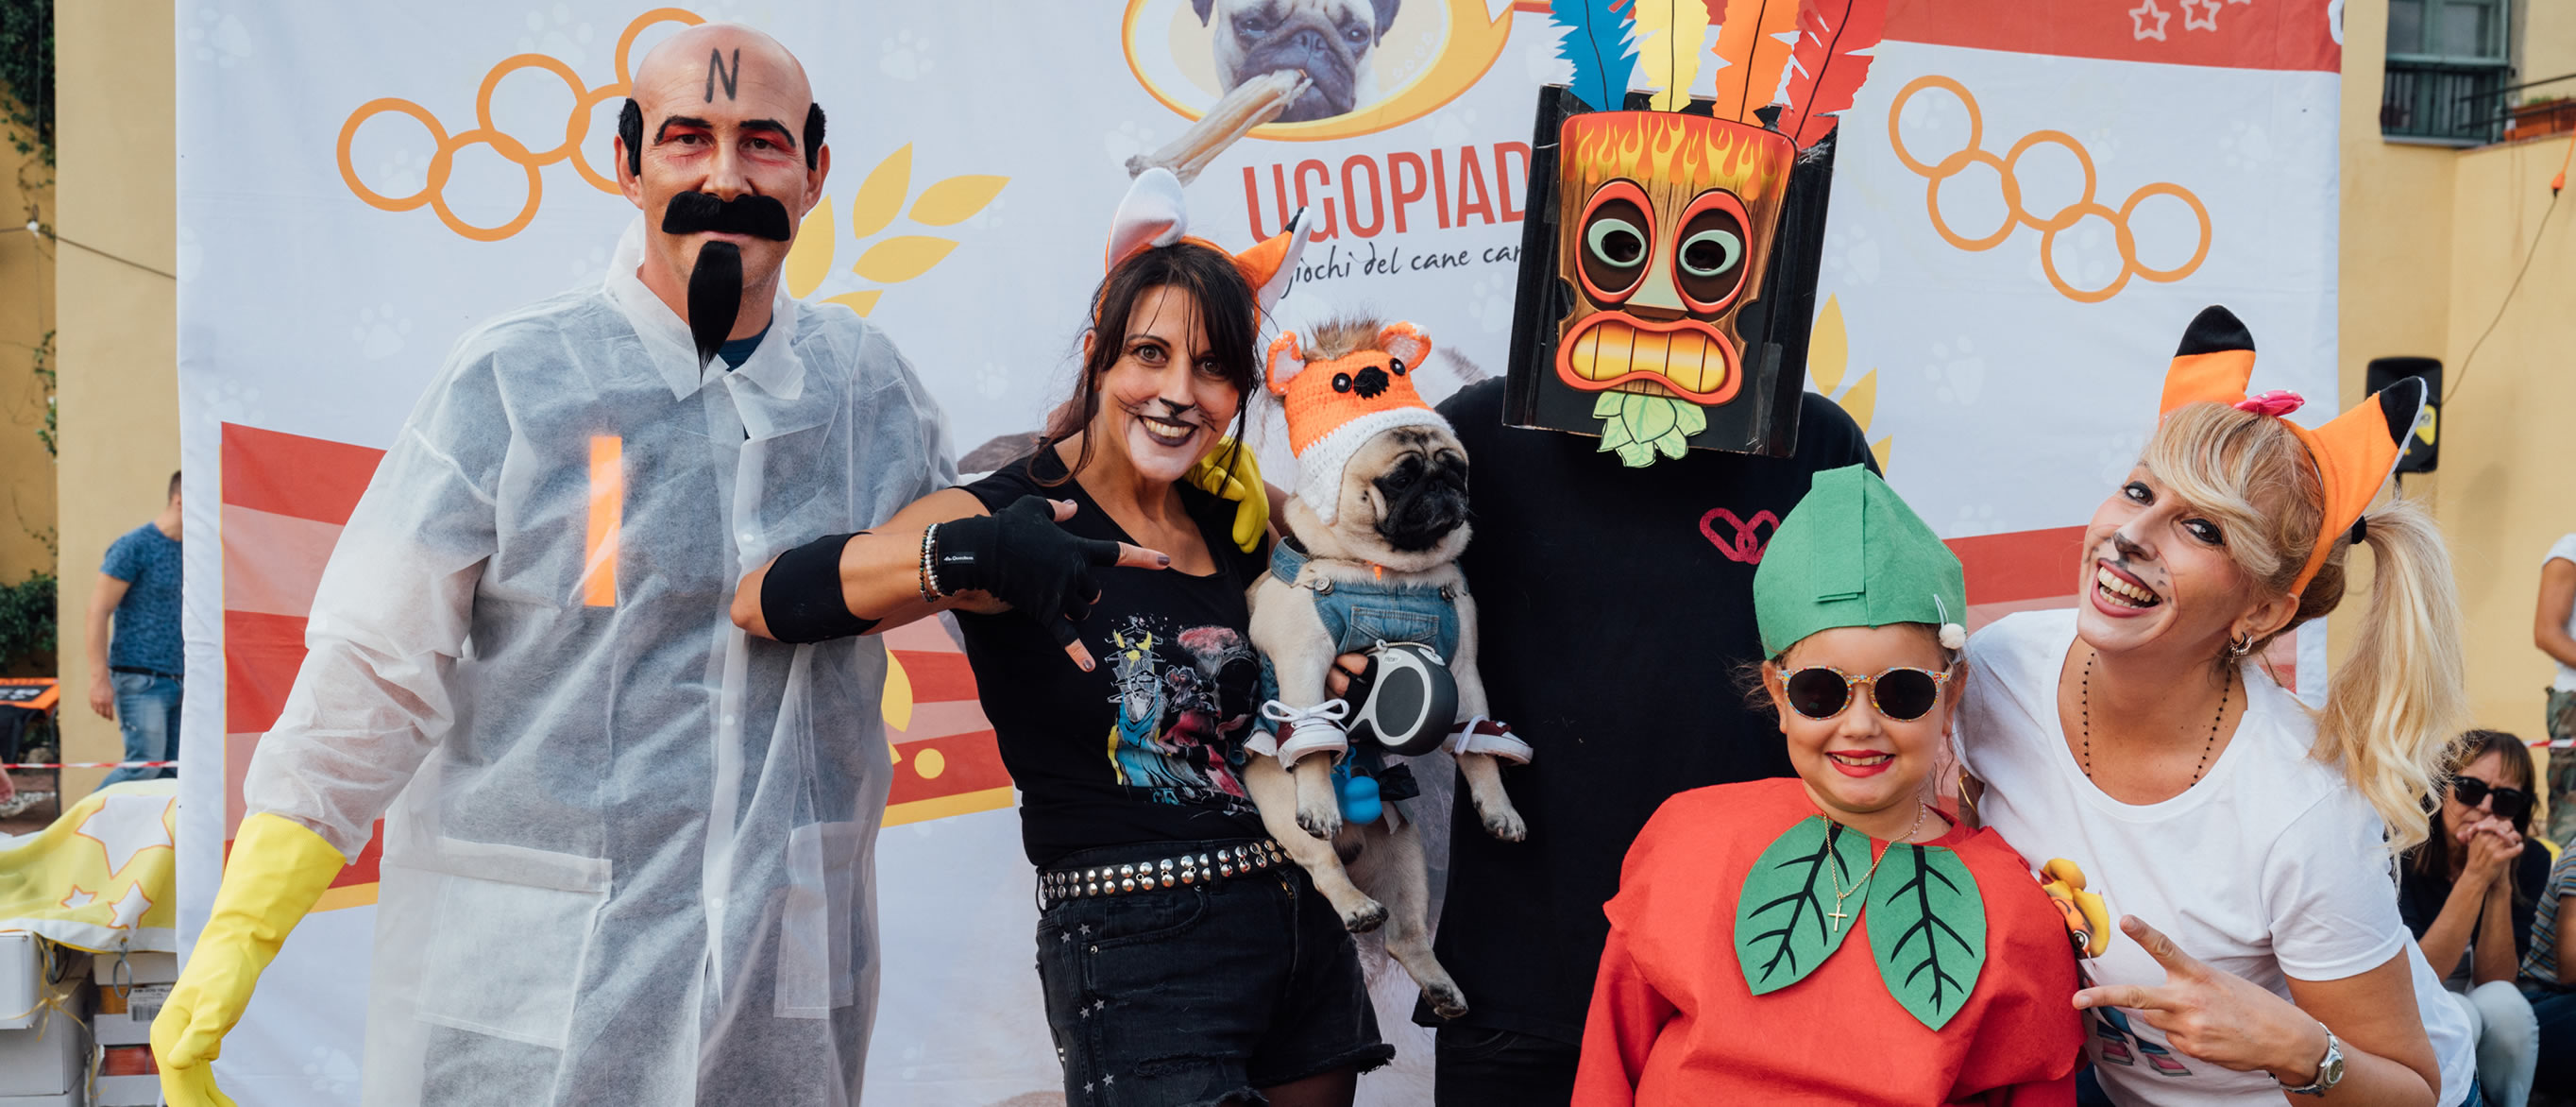 Ugopiadi 2019 - Le Olimpiadi del cane carlino